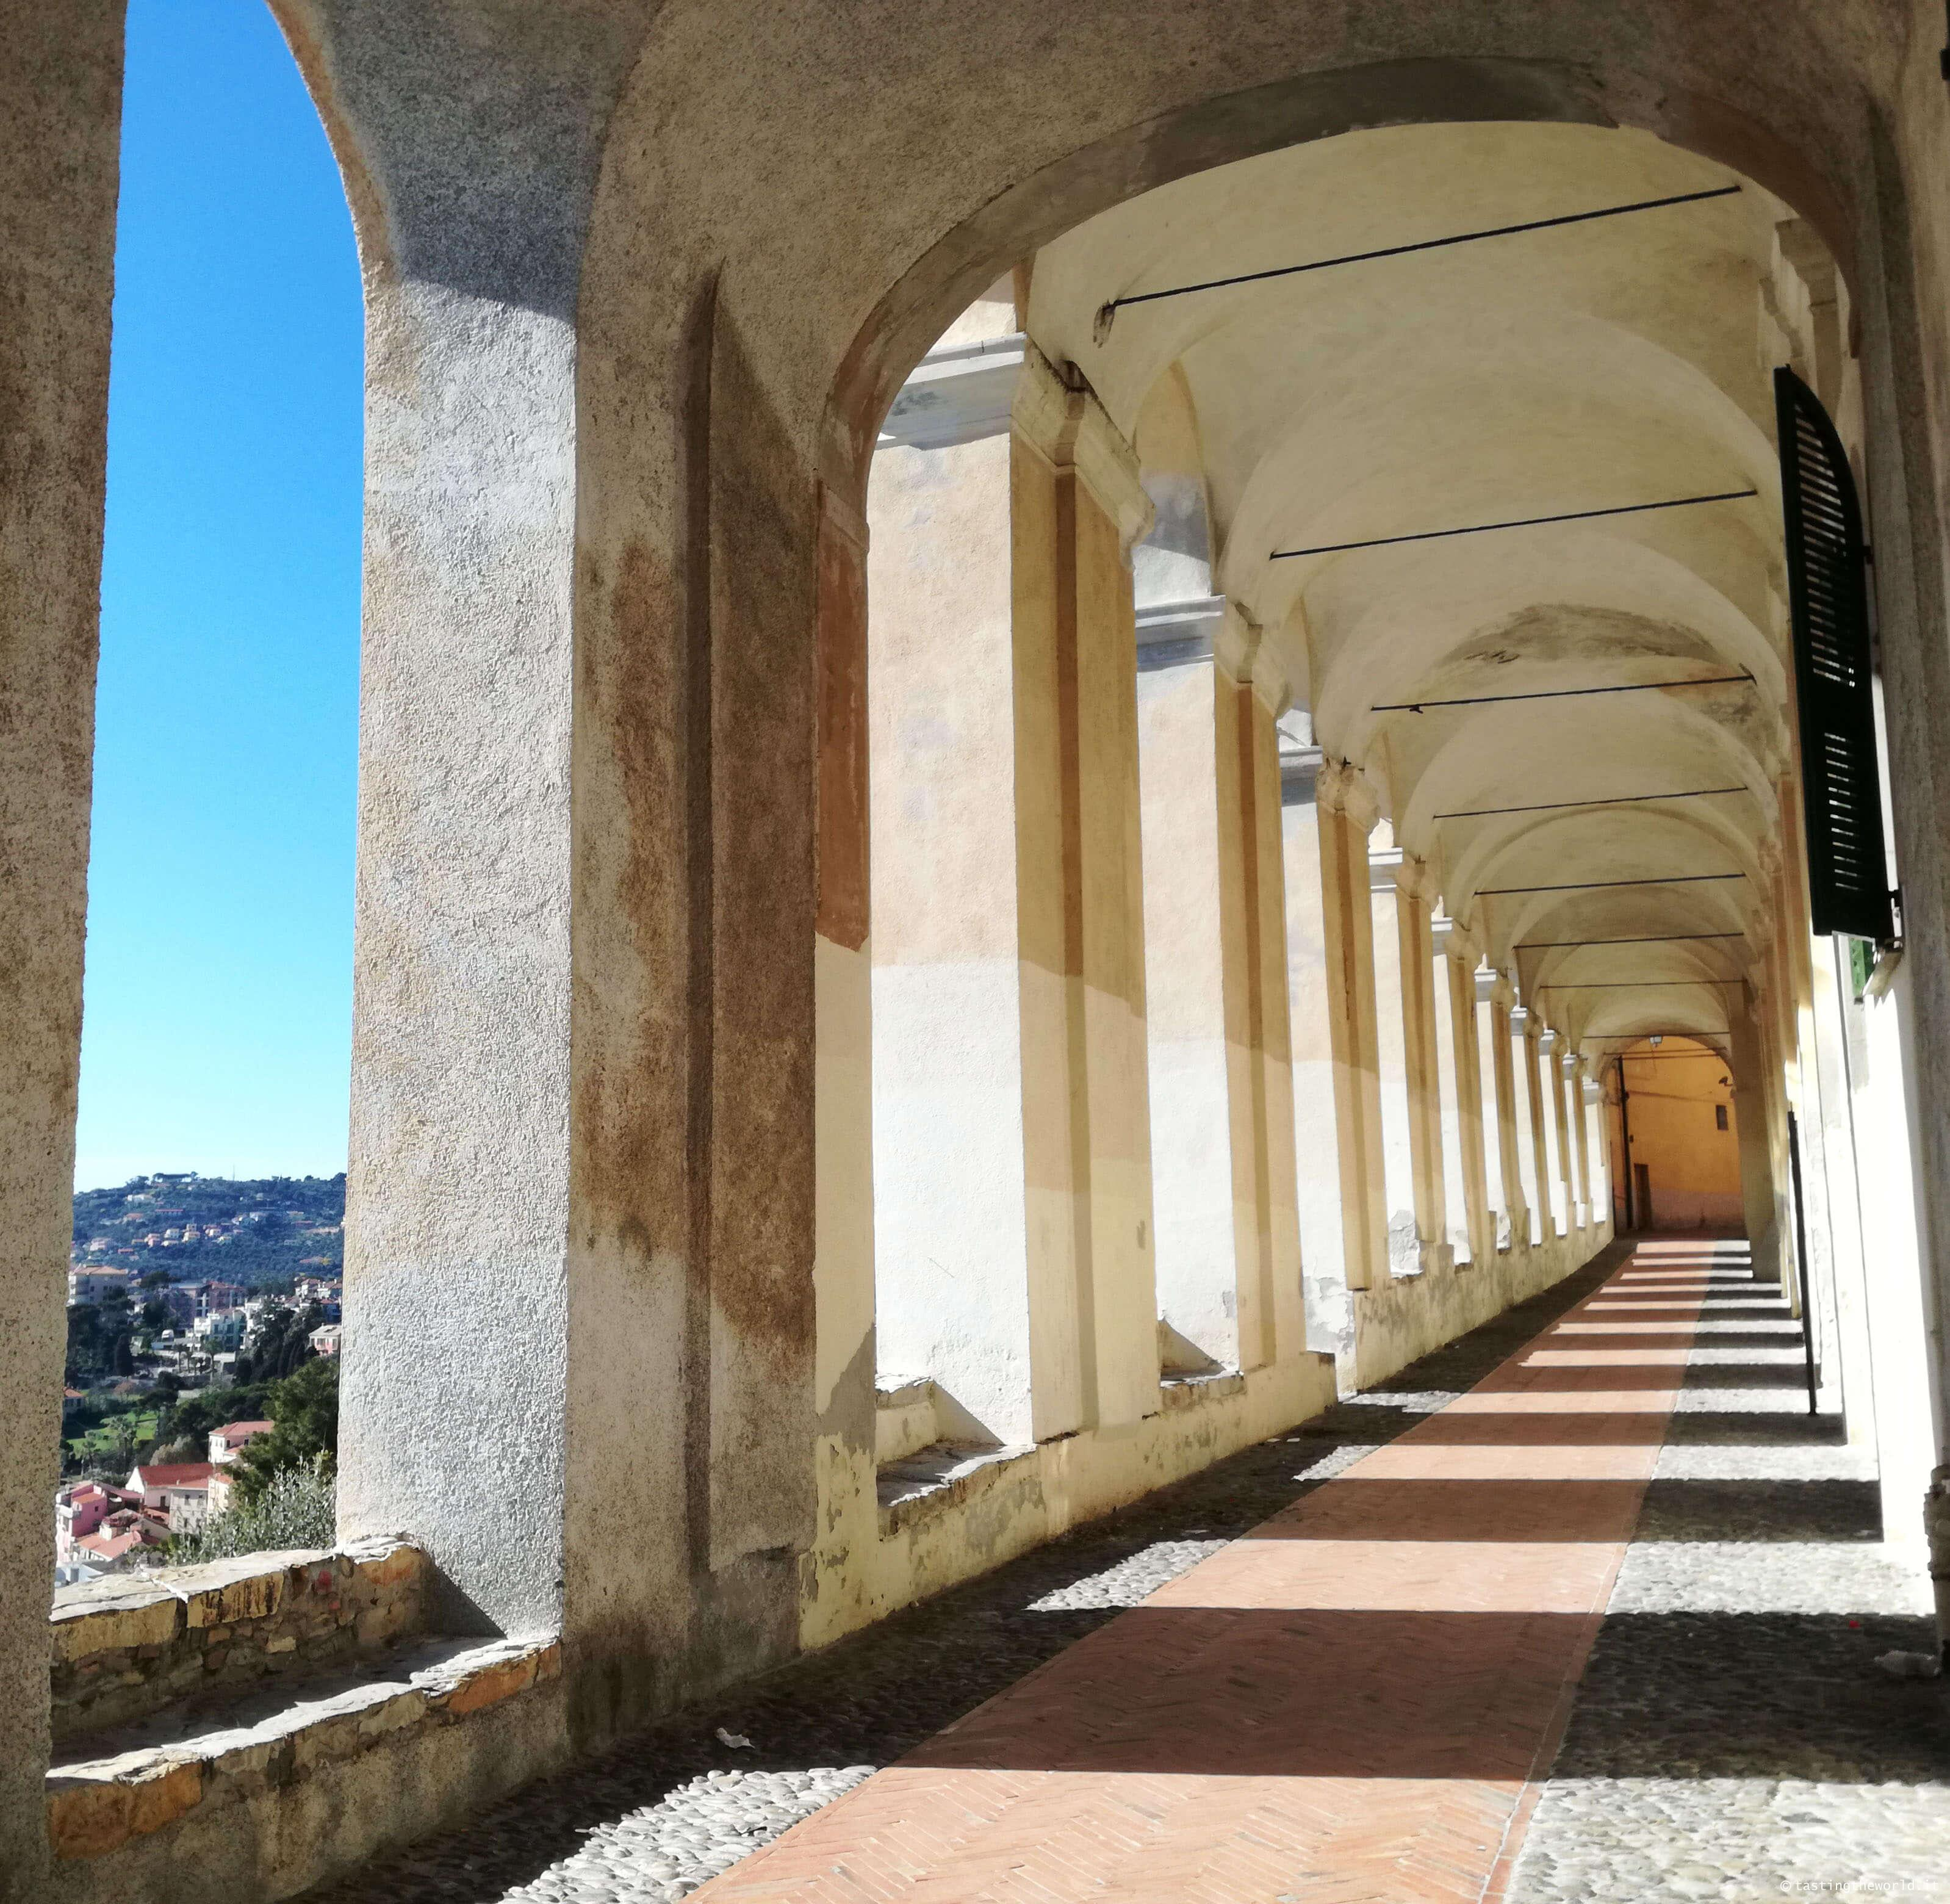 Logge di Santa Chiara, Imperia (Parasio)